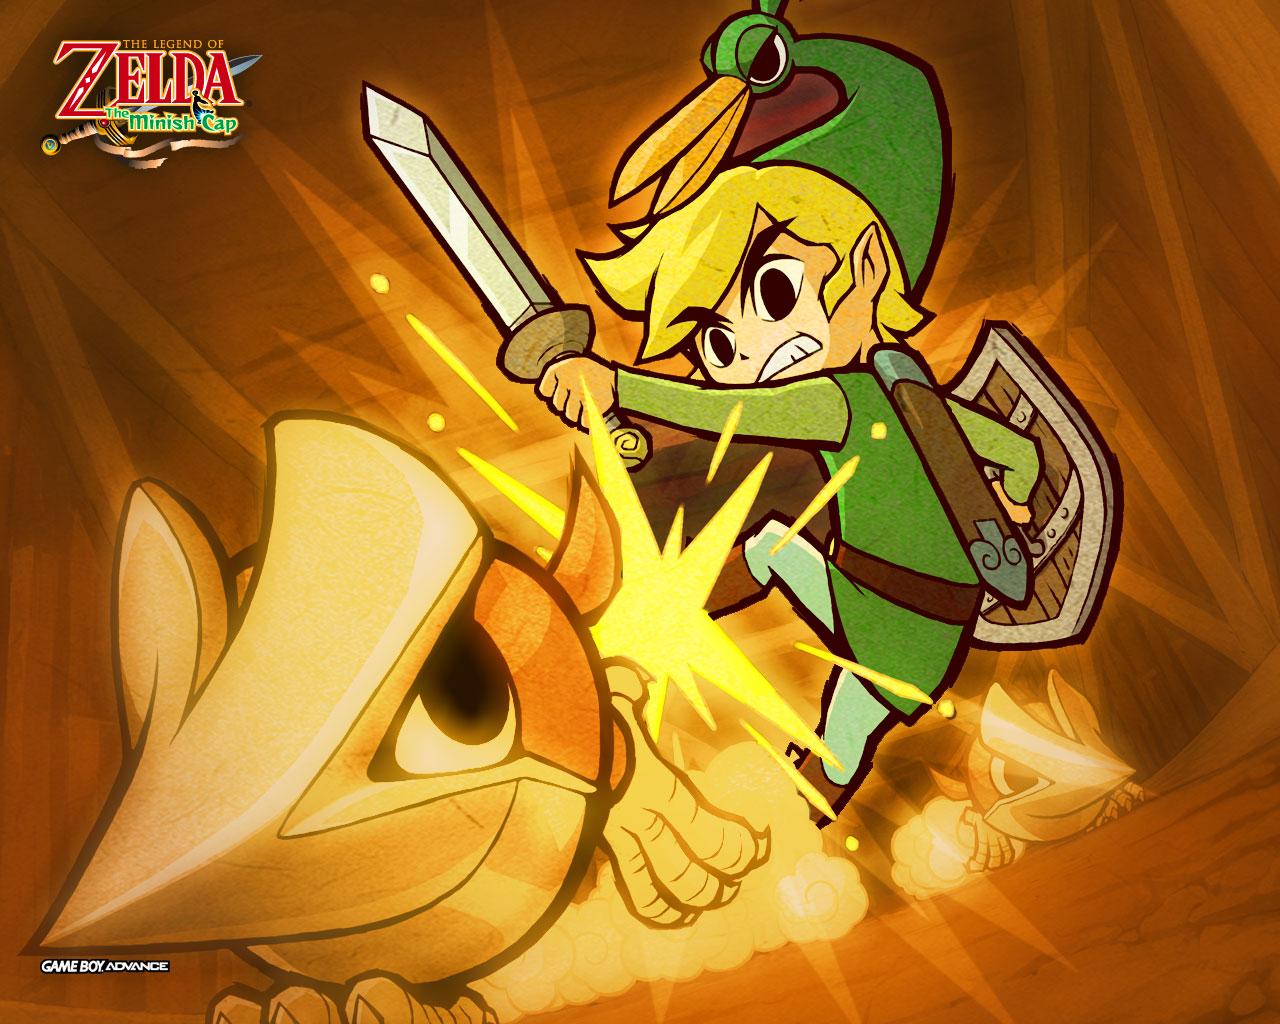 Pokemon Legend Of Zelda Ssb Phone Wallpaper By Bestselenana On